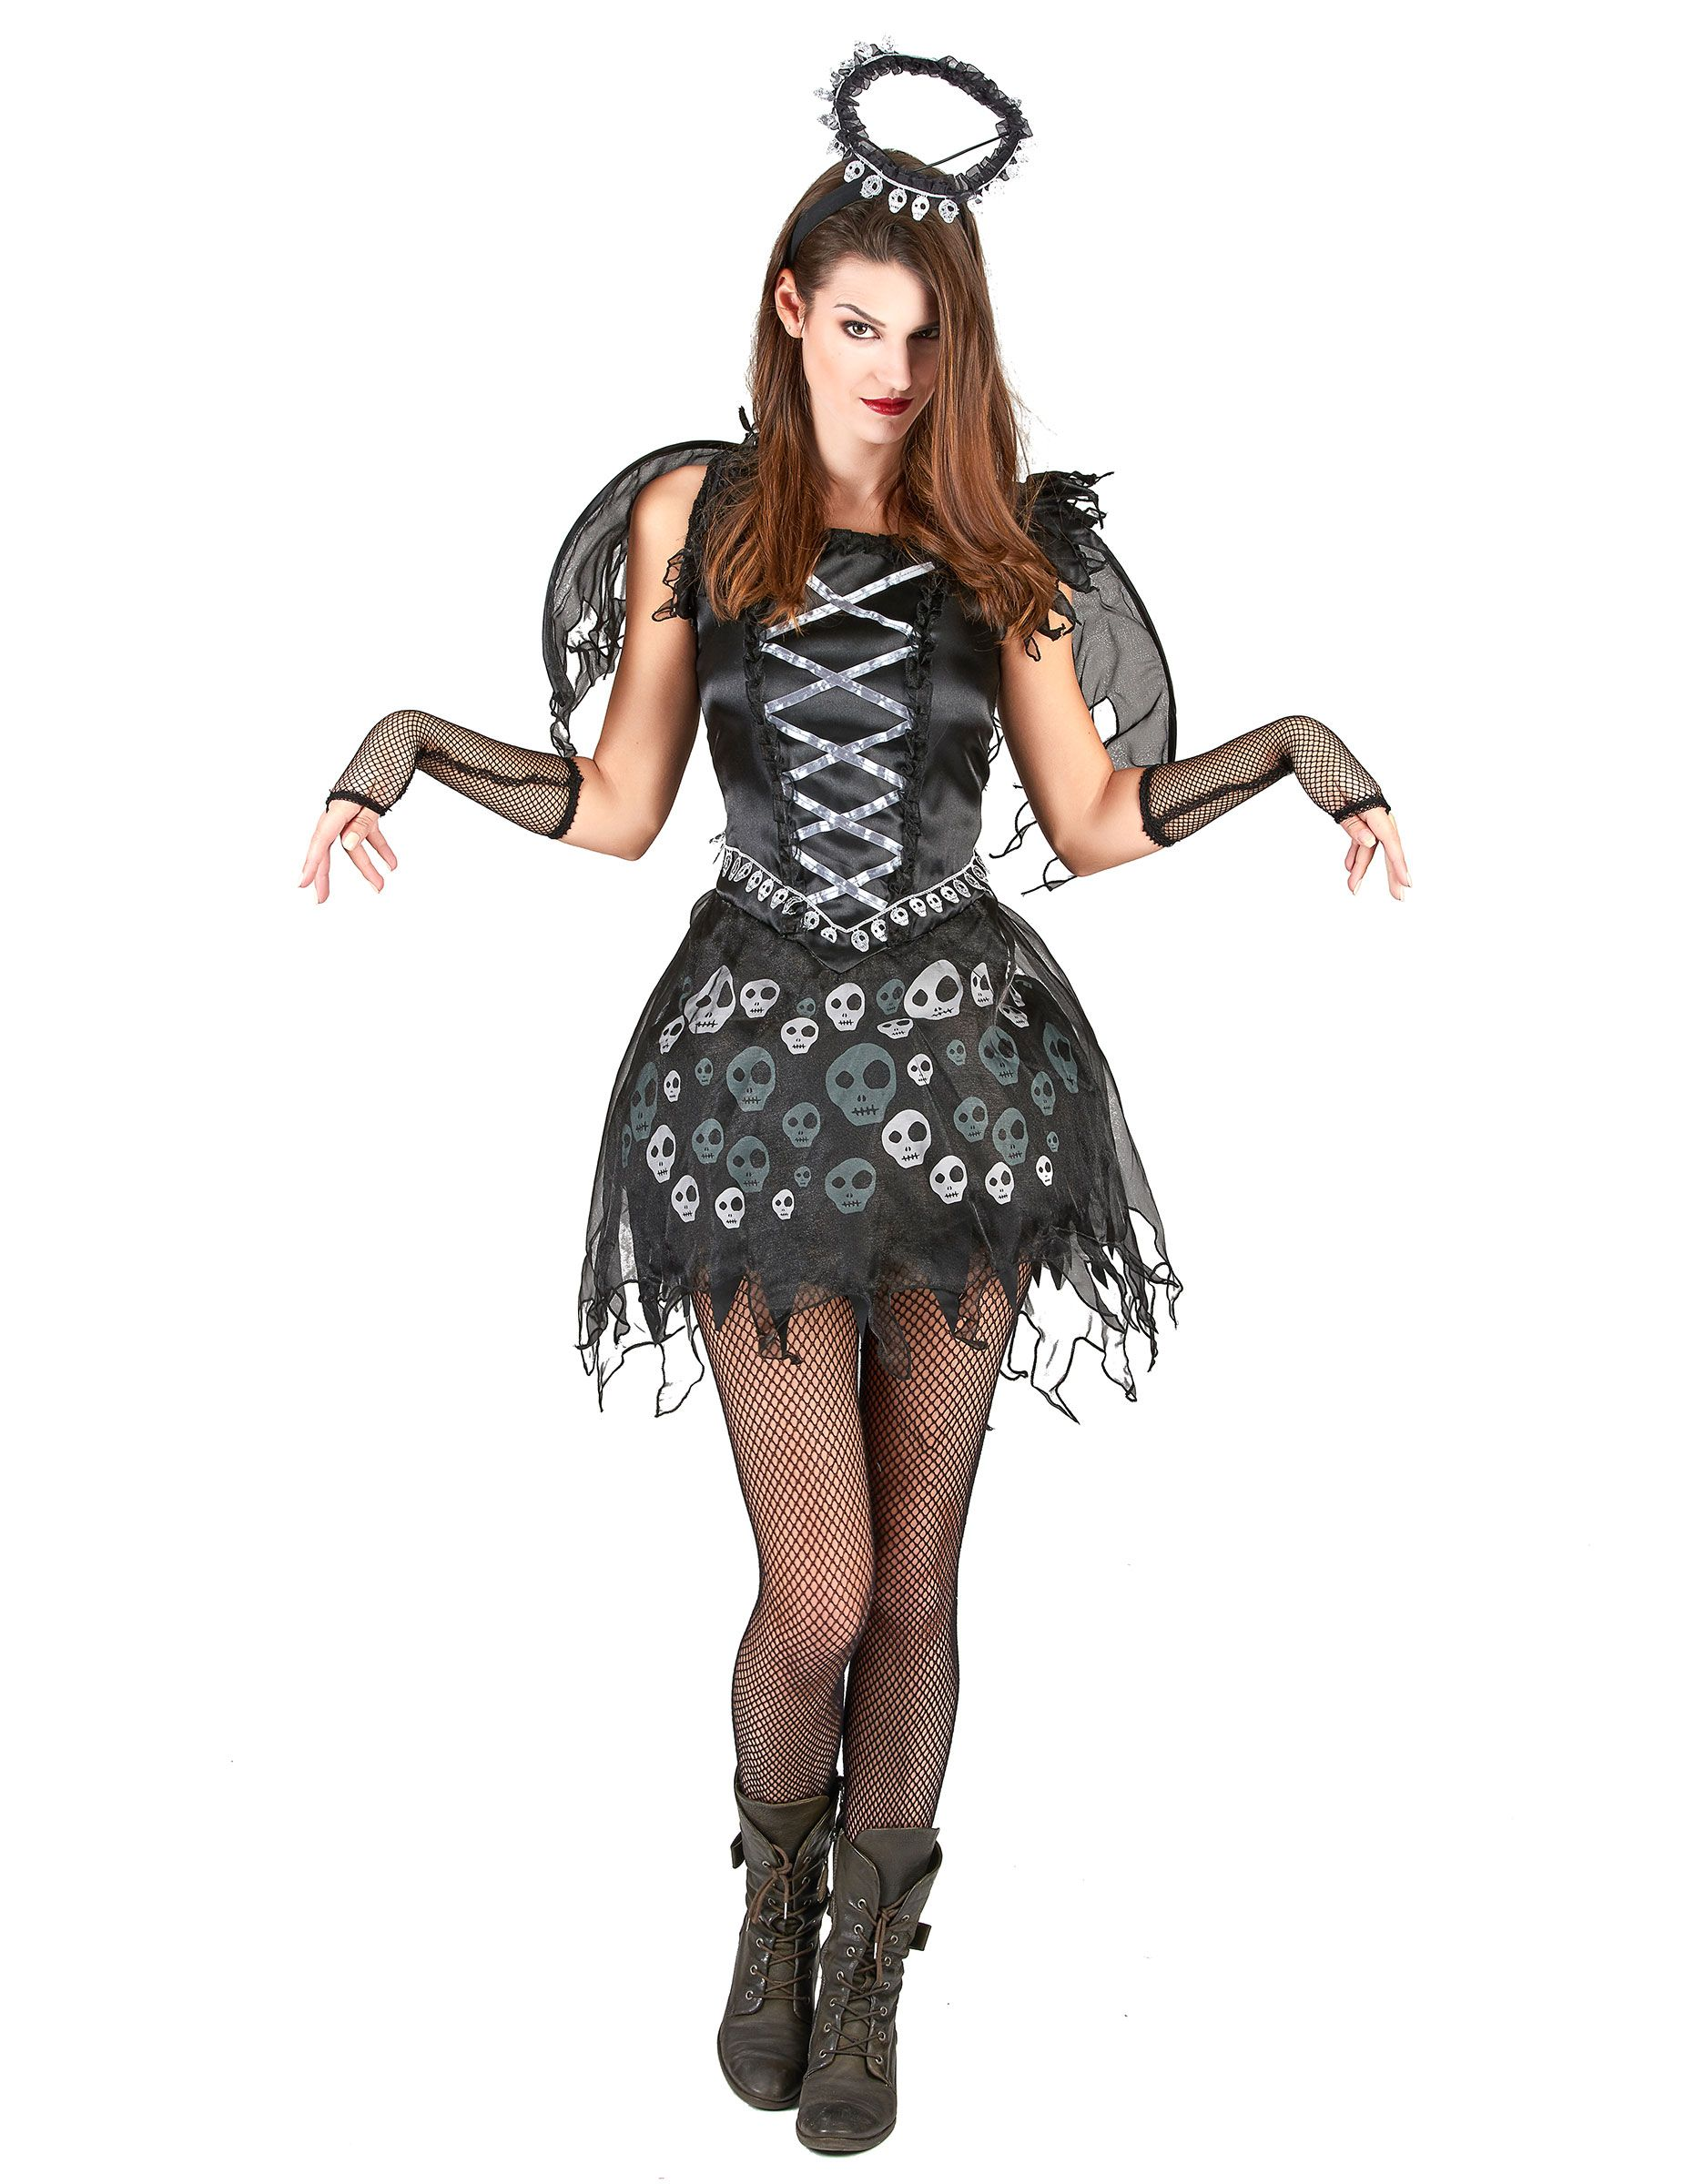 9d32ce7e492b Disfraz de ángel gótico para mujer  Este disfraz de ángel gótico para mujer  está compuesto